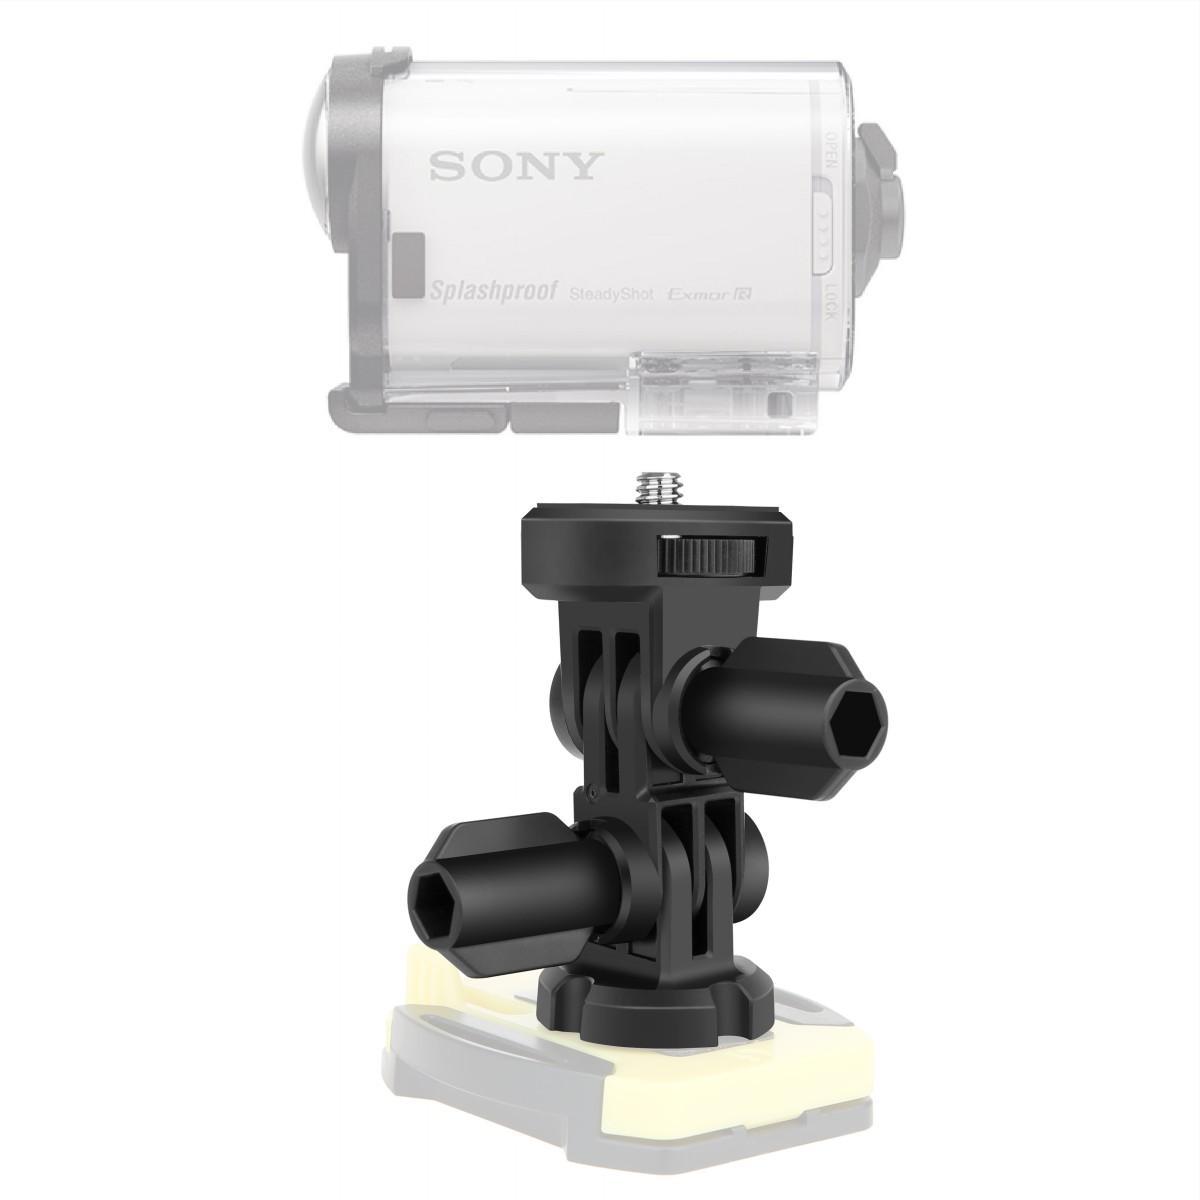 Daftar Harga Handycam Sony Fdr Ax53 Murah Terbaru November 2018 Camcorder Ax40 Garansi Resmi Dz Bpm1 Backpack Mount Untuk Action Camera X1000v Hdr As200v